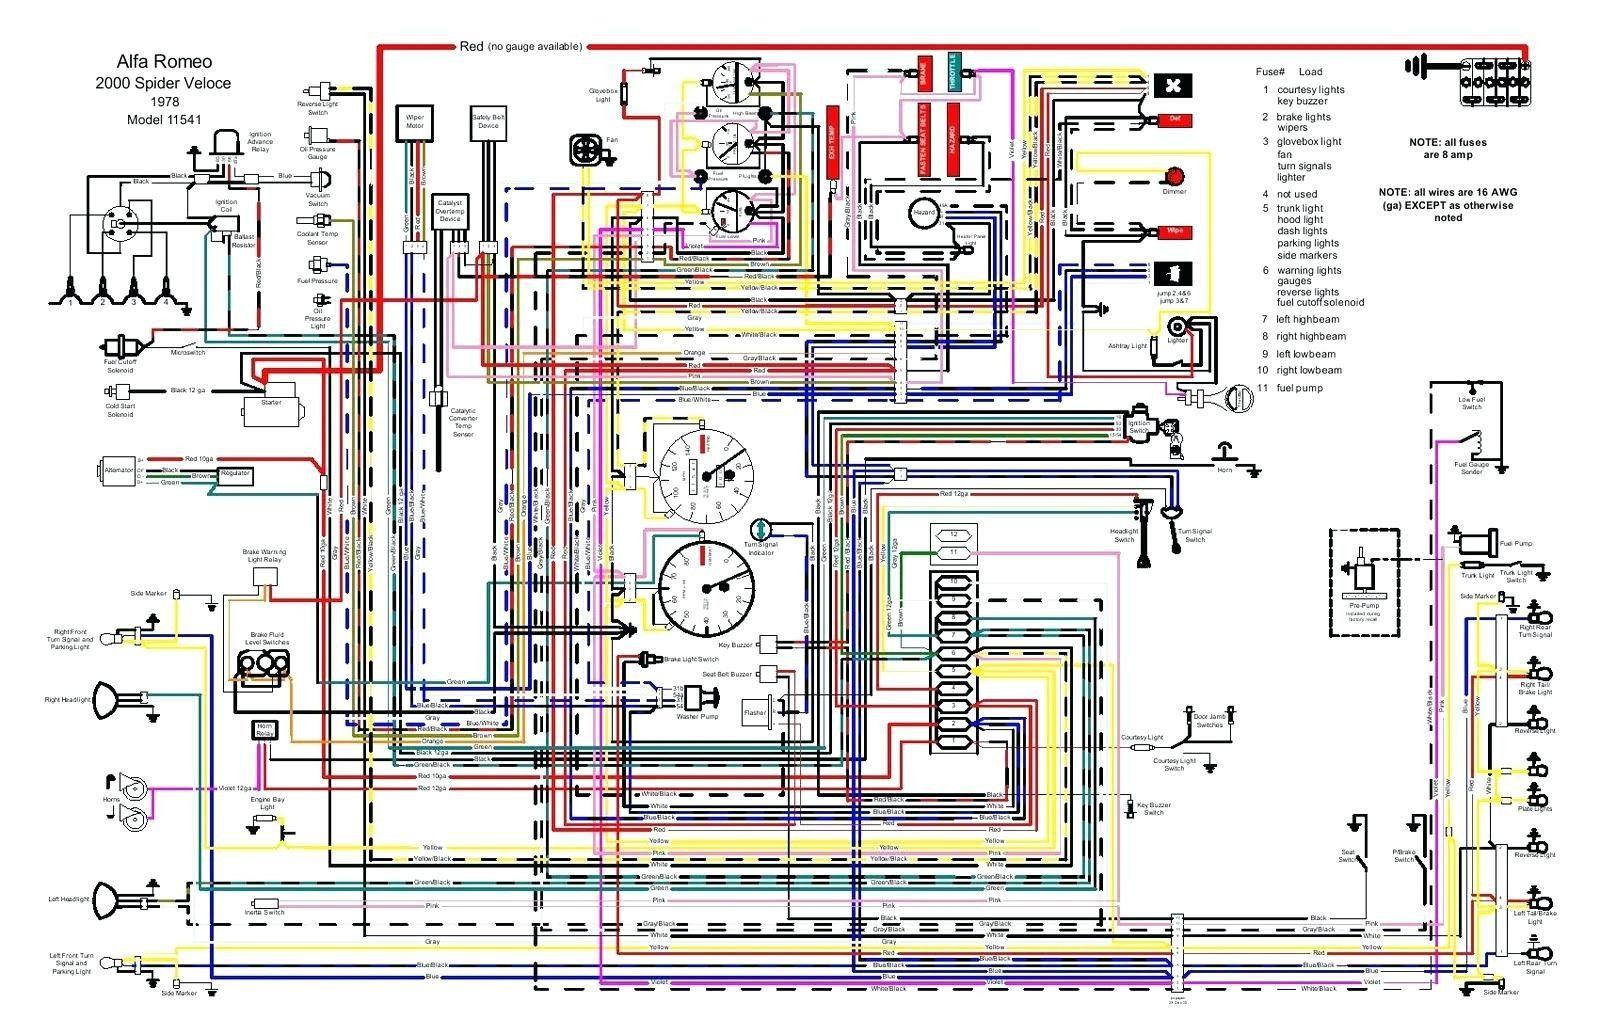 20 Auto Car Wiring Diagram Program Bacamajalah In 2020 Electrical Wiring Diagram Electrical Diagram Trailer Wiring Diagram